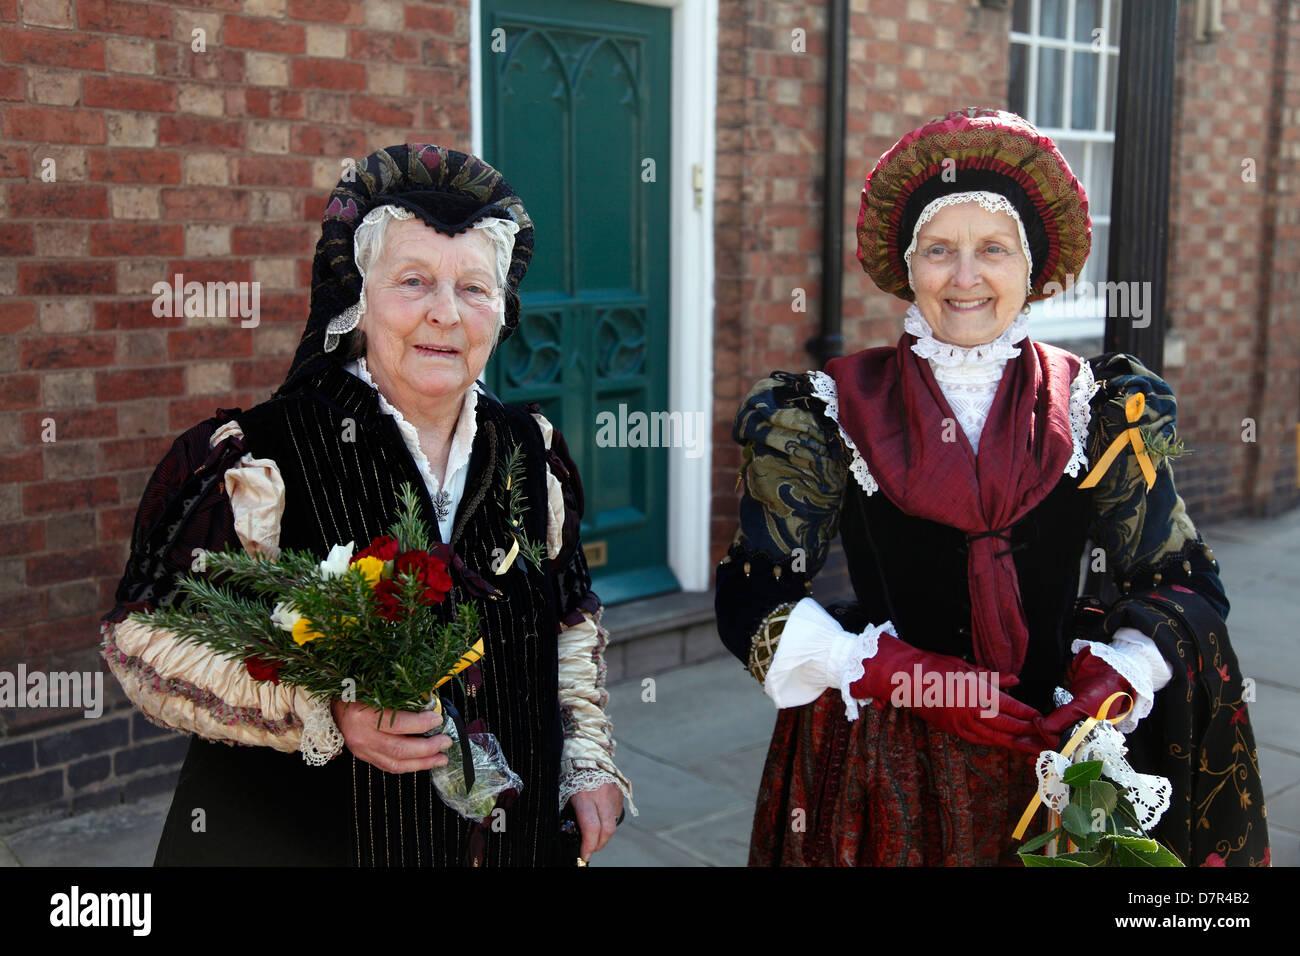 Shakespearian Ladies at the annual Birthday Memorial Parade at Stratford upon Avon. - Stock Image